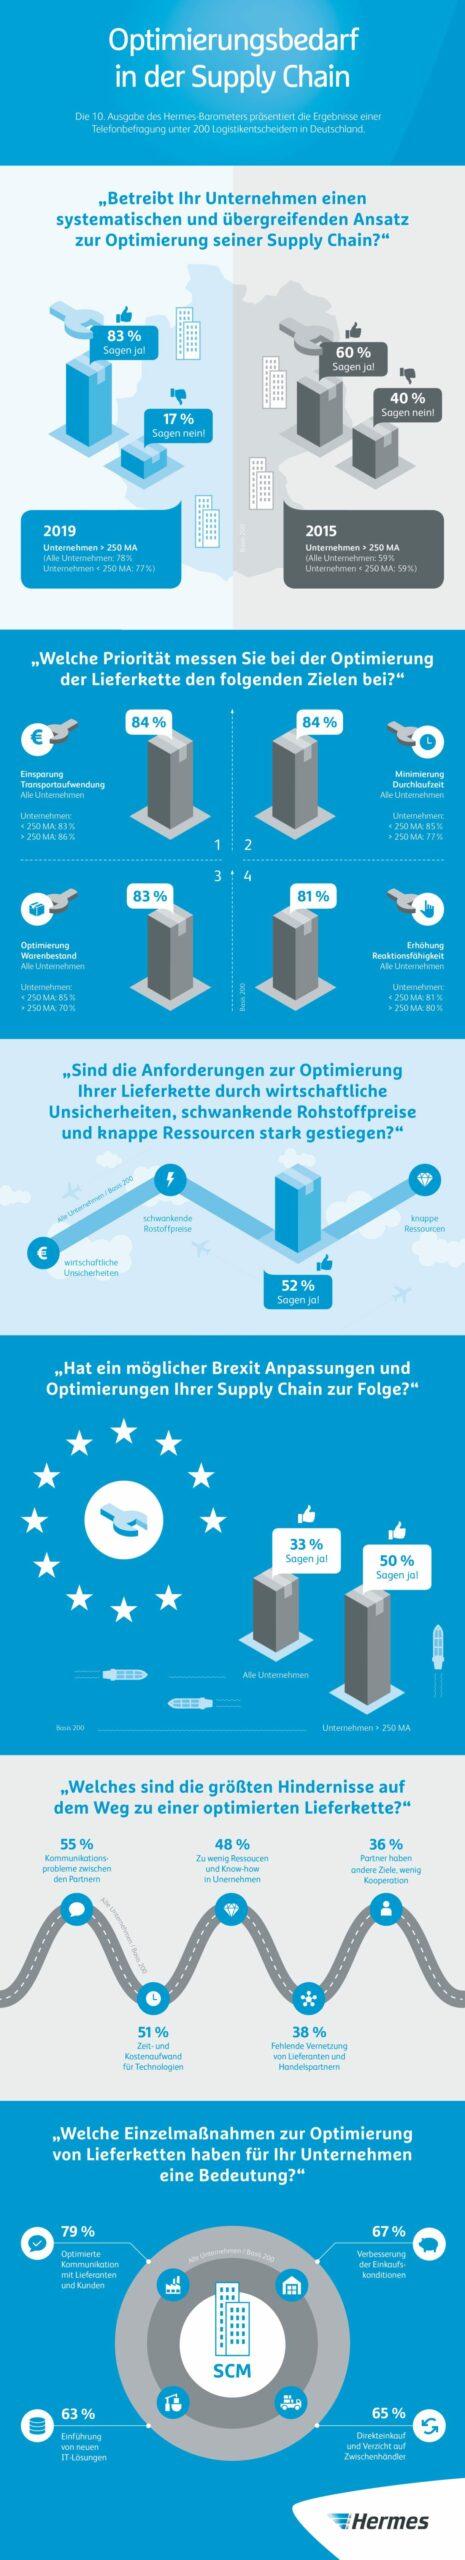 Optimierungsbedarf in der Supply Chain: Potential erkannt, Komplexität verkannt